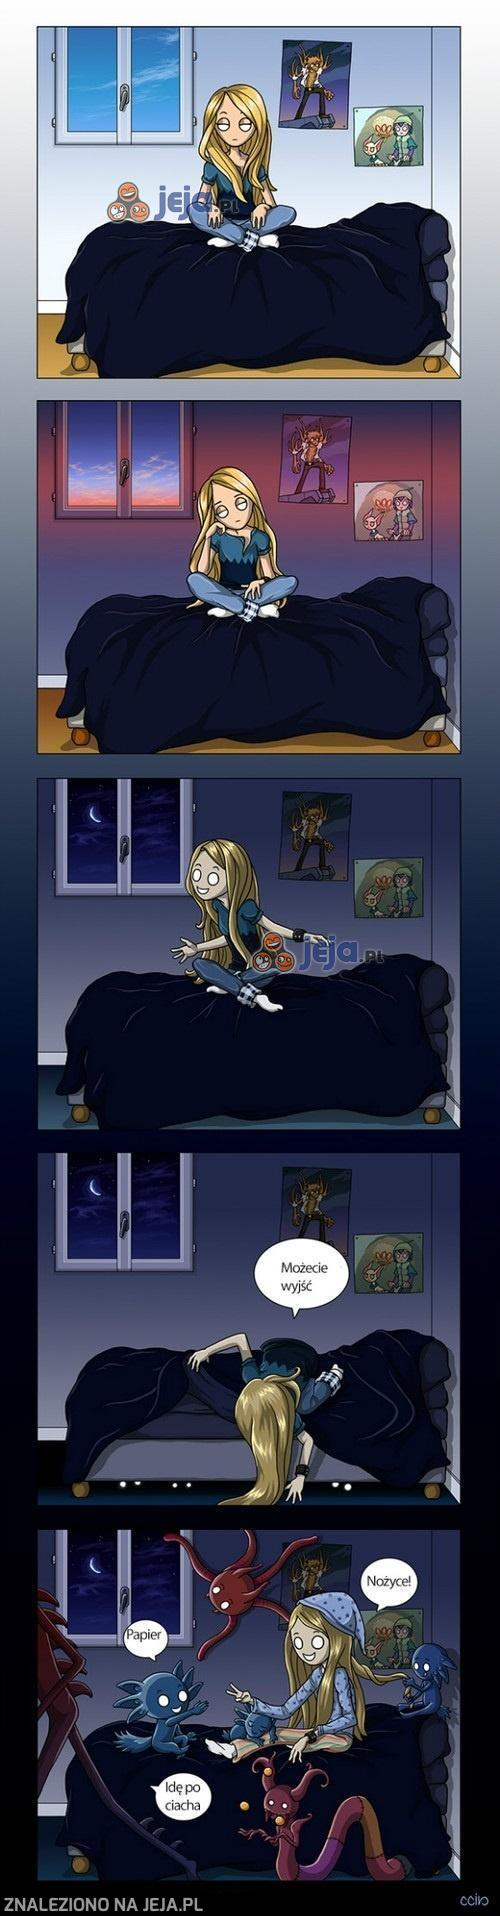 Nocne zabawy z kumplami spod łóżka